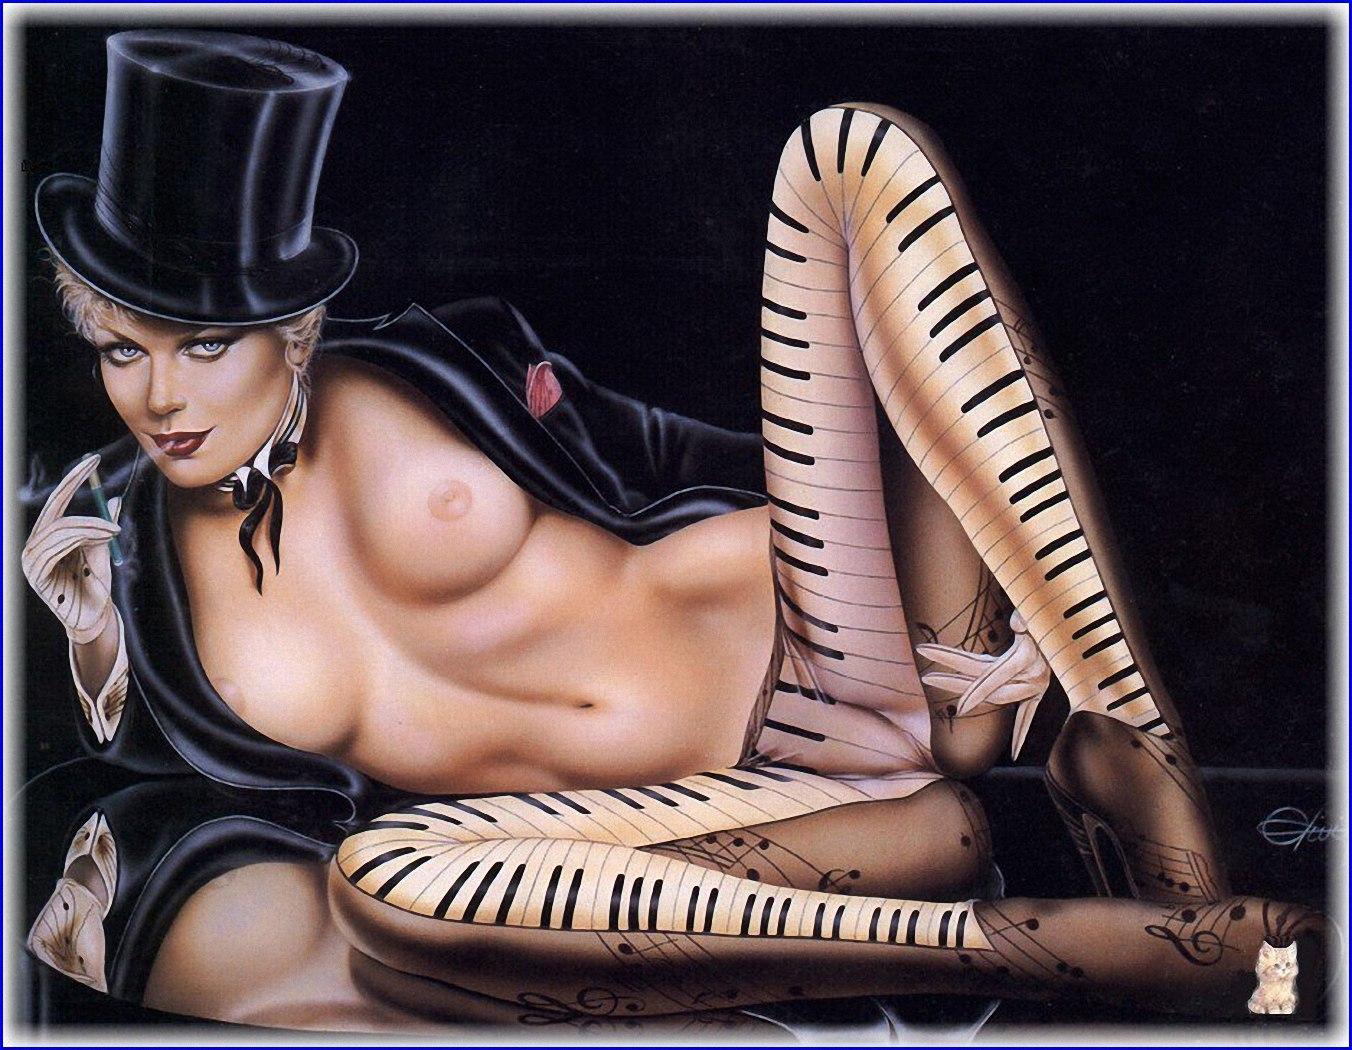 Эротик арт галерея 9 фотография